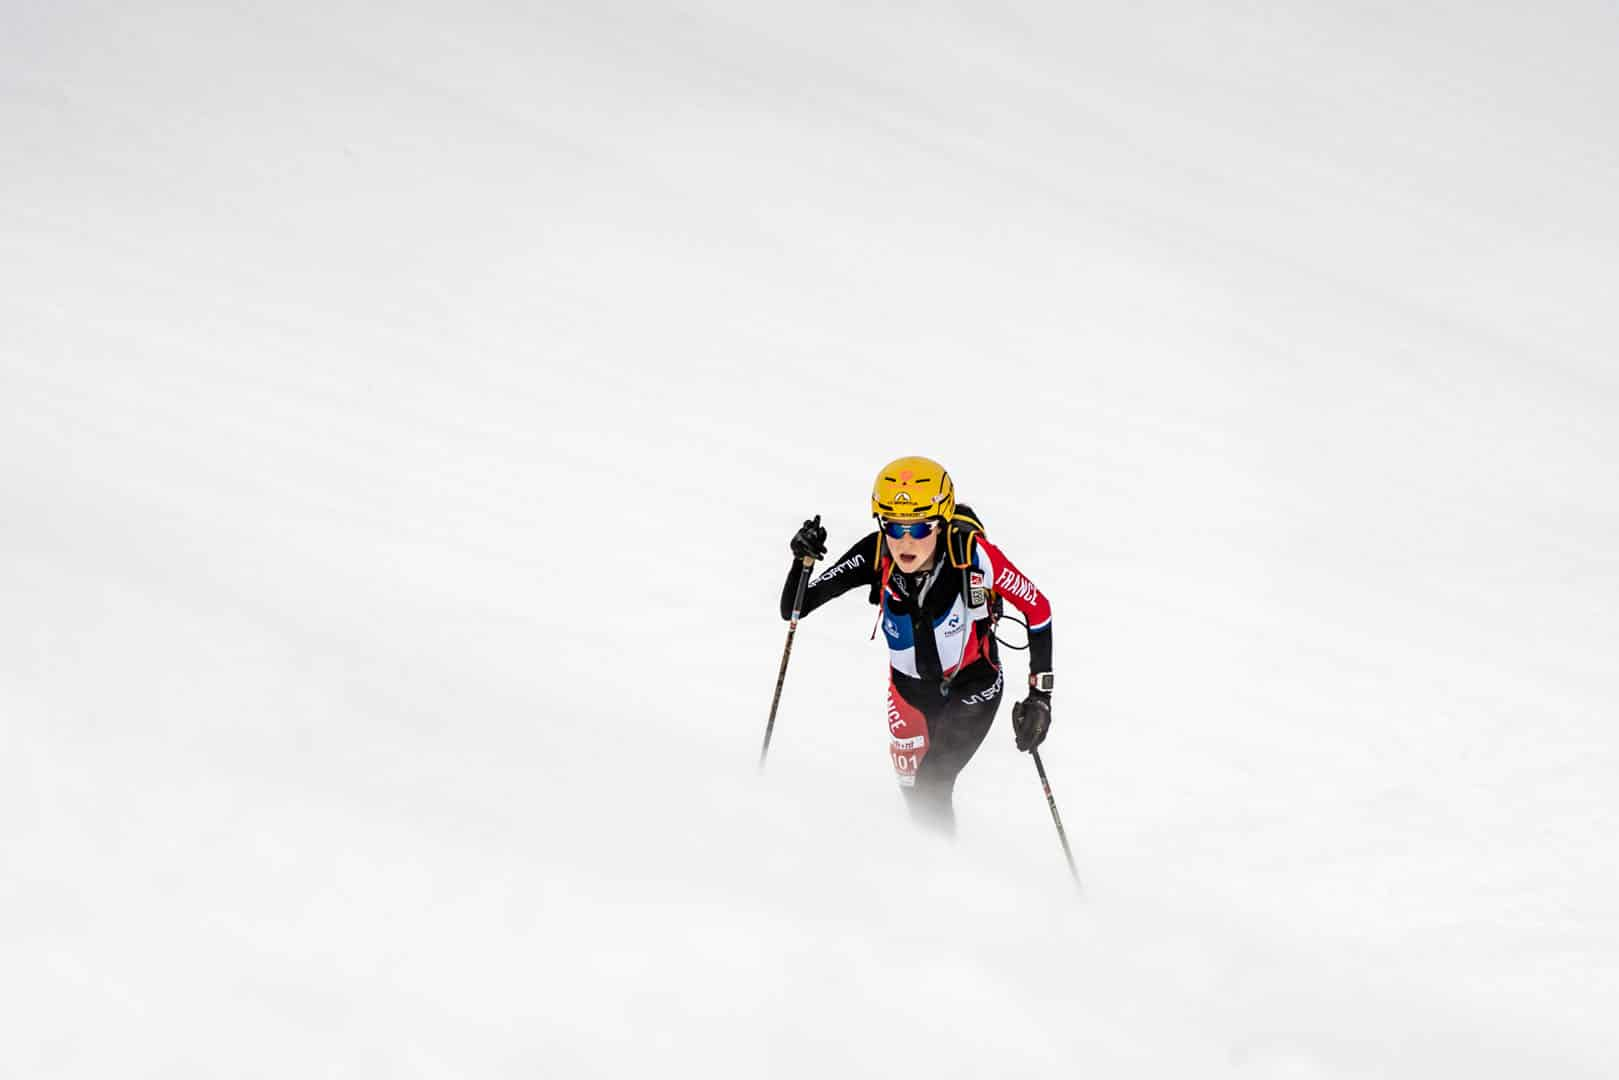 Direct infos – Février 2021 – Equipe de France de ski-alpinisme